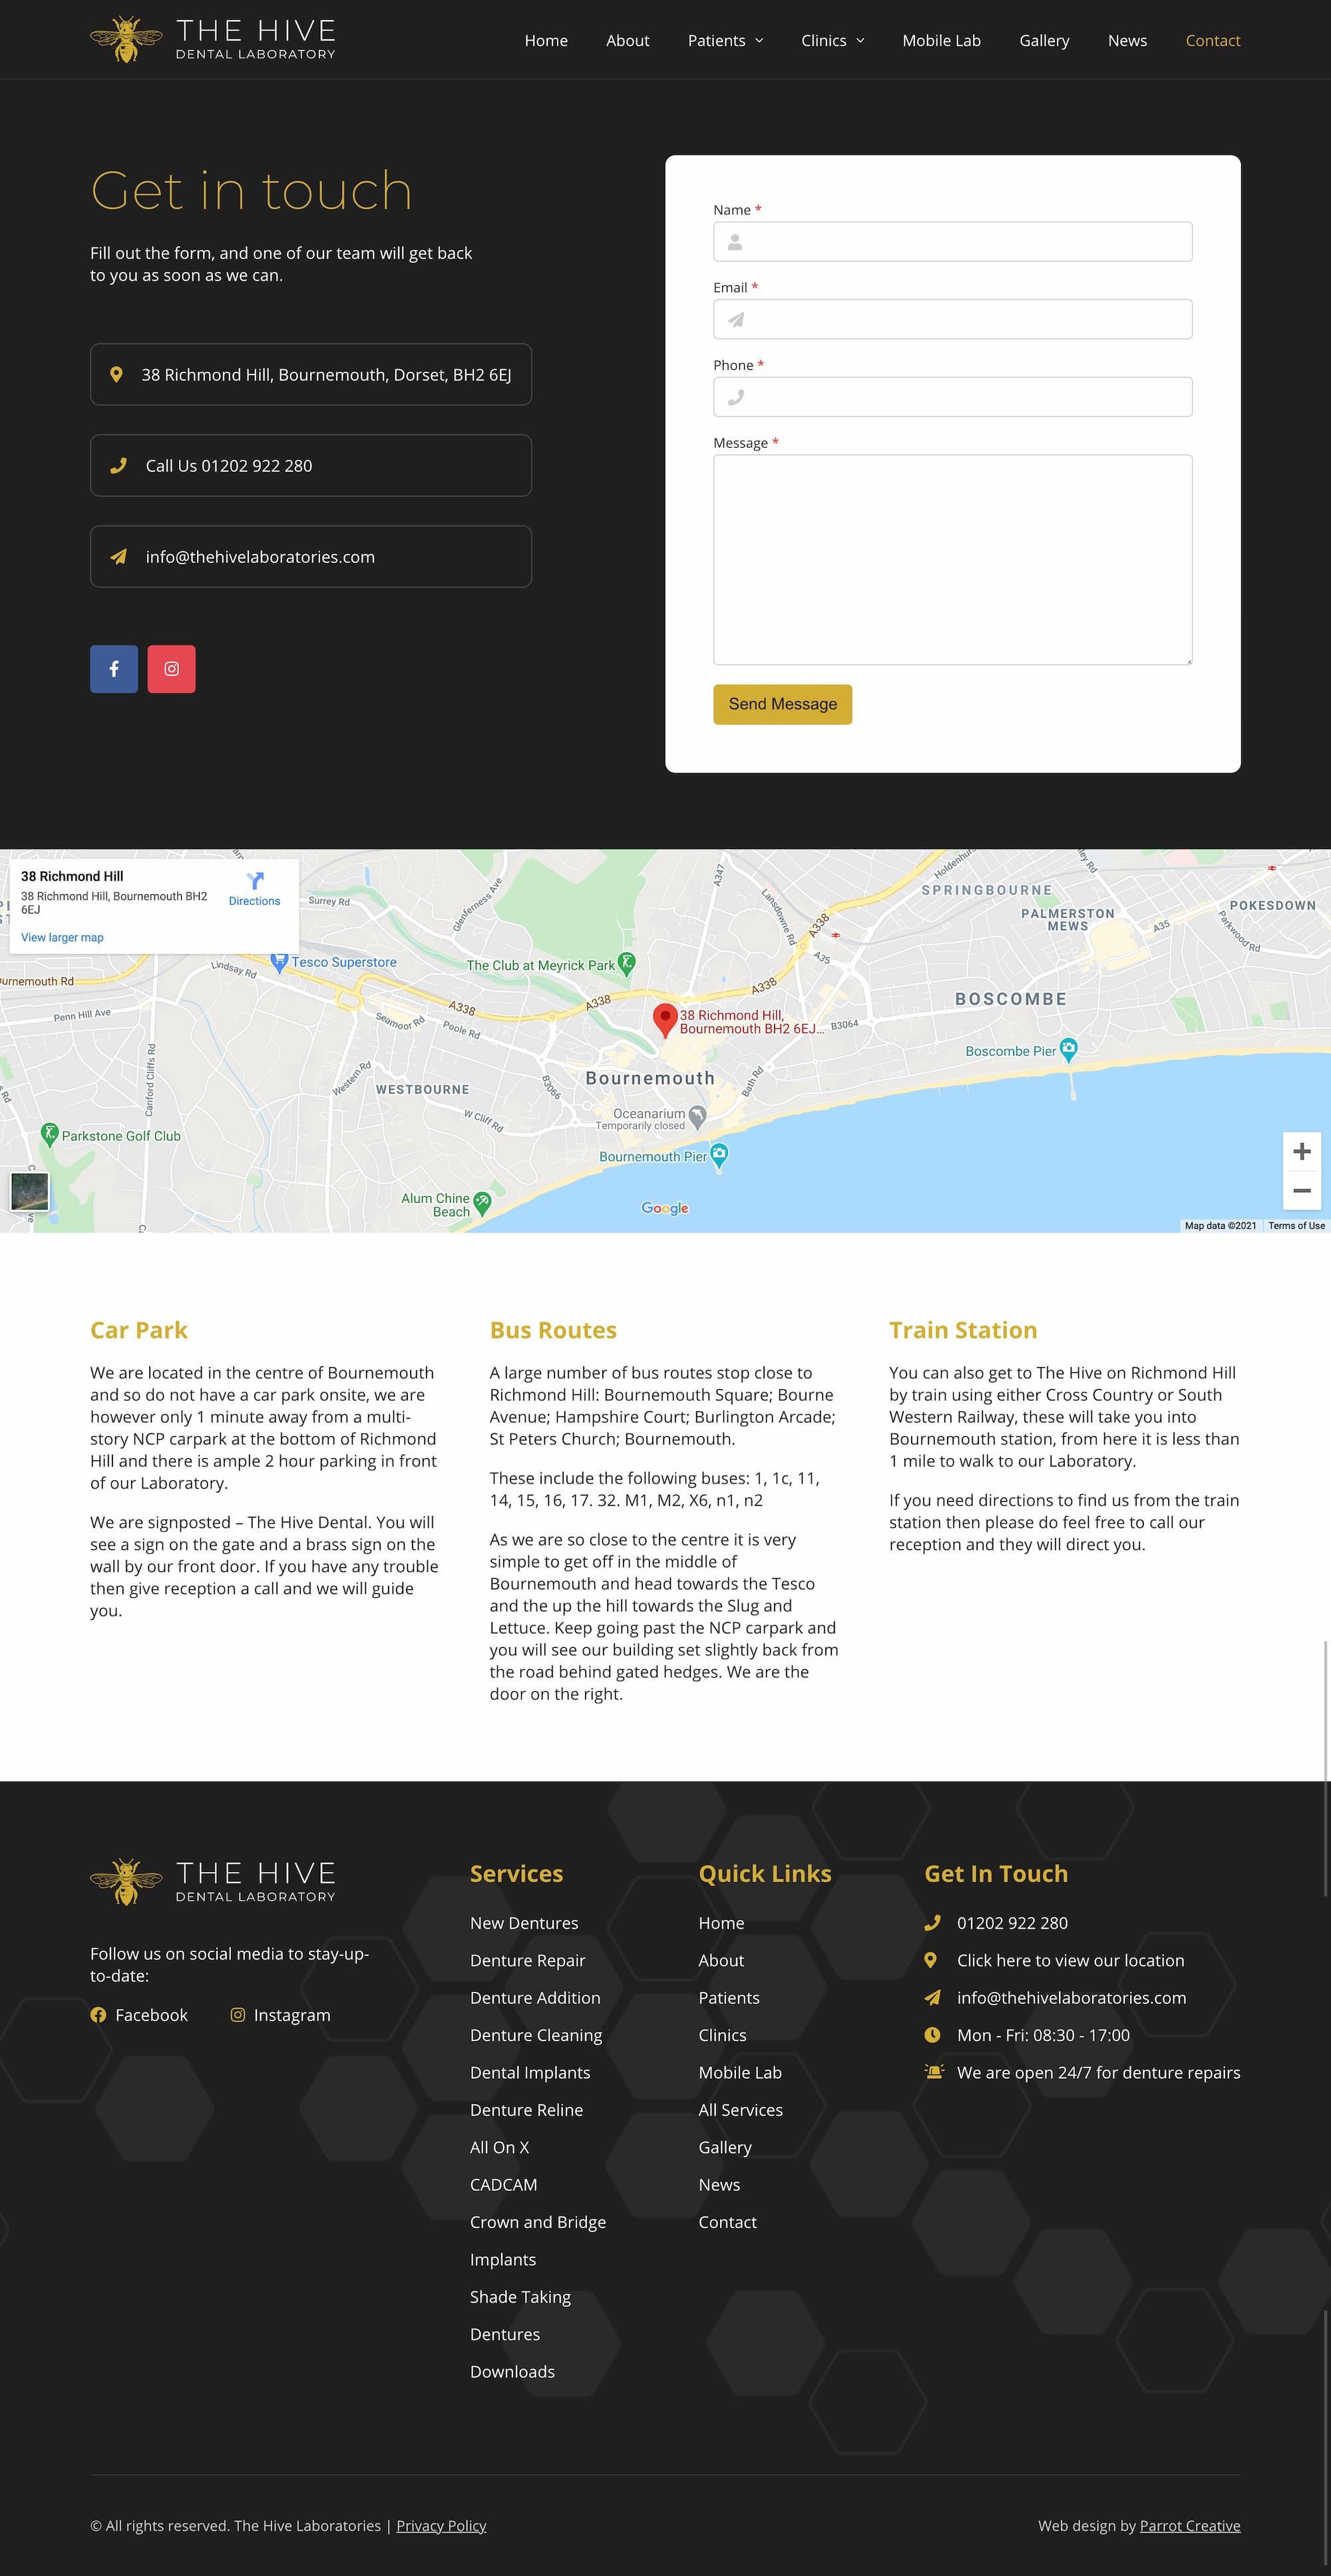 Dorset denture clinic contact page design